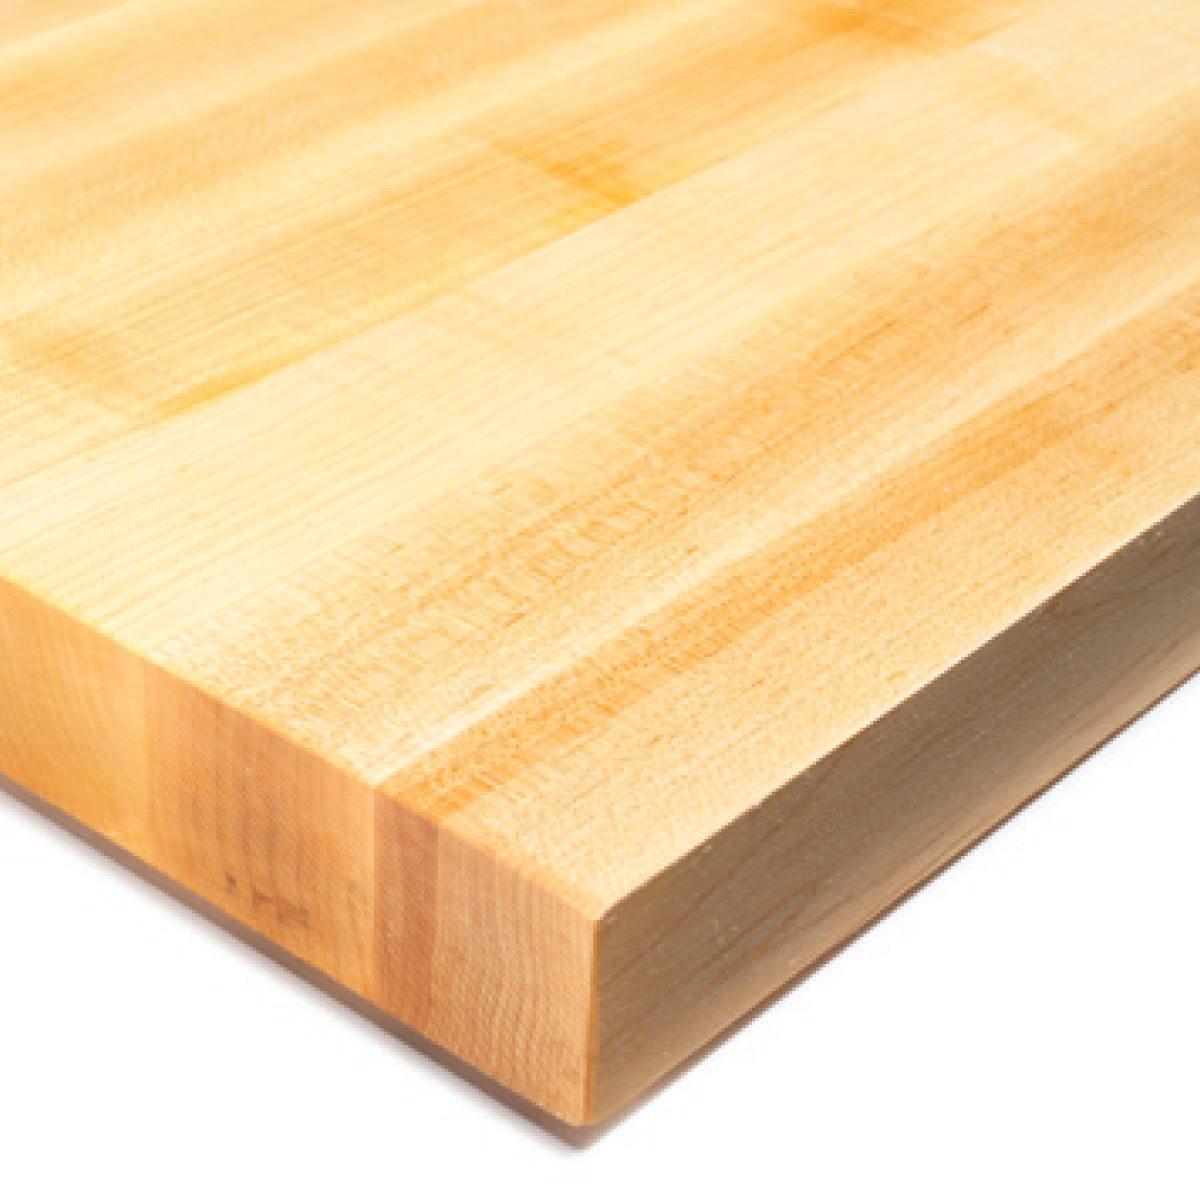 Buying Countertops: Plastic Laminates, Granite and Solid